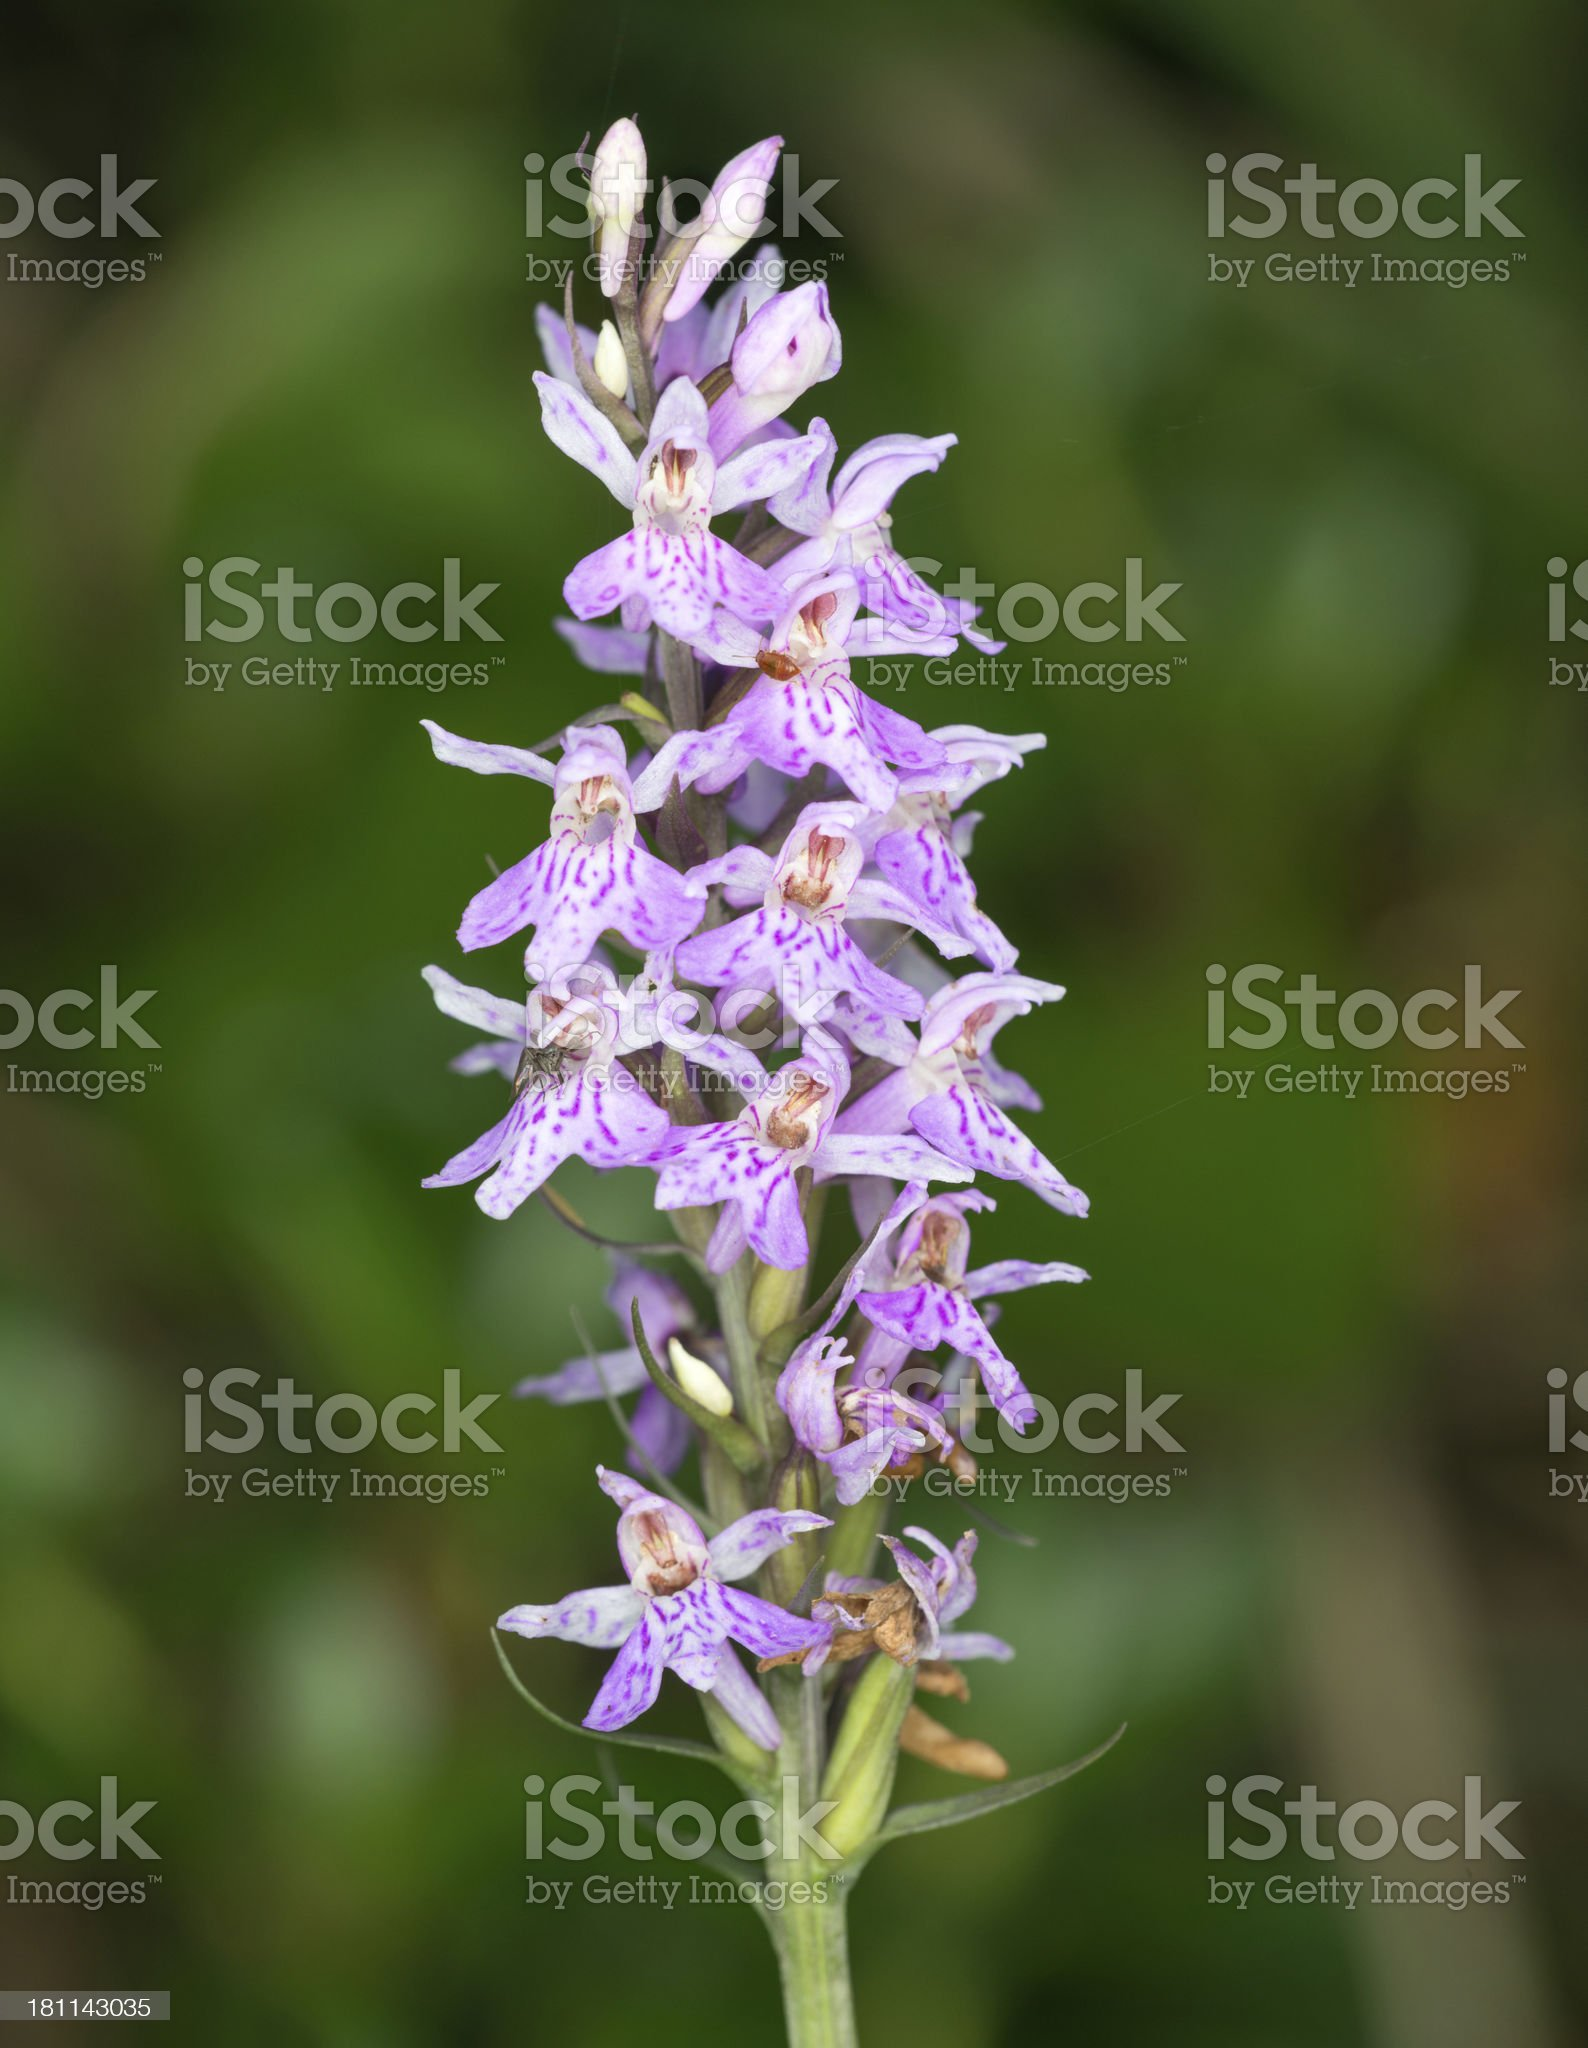 Gefleckte Knabenkraut, Heath Spotted Orchid, Dactylorhiza Maculata royalty-free stock photo